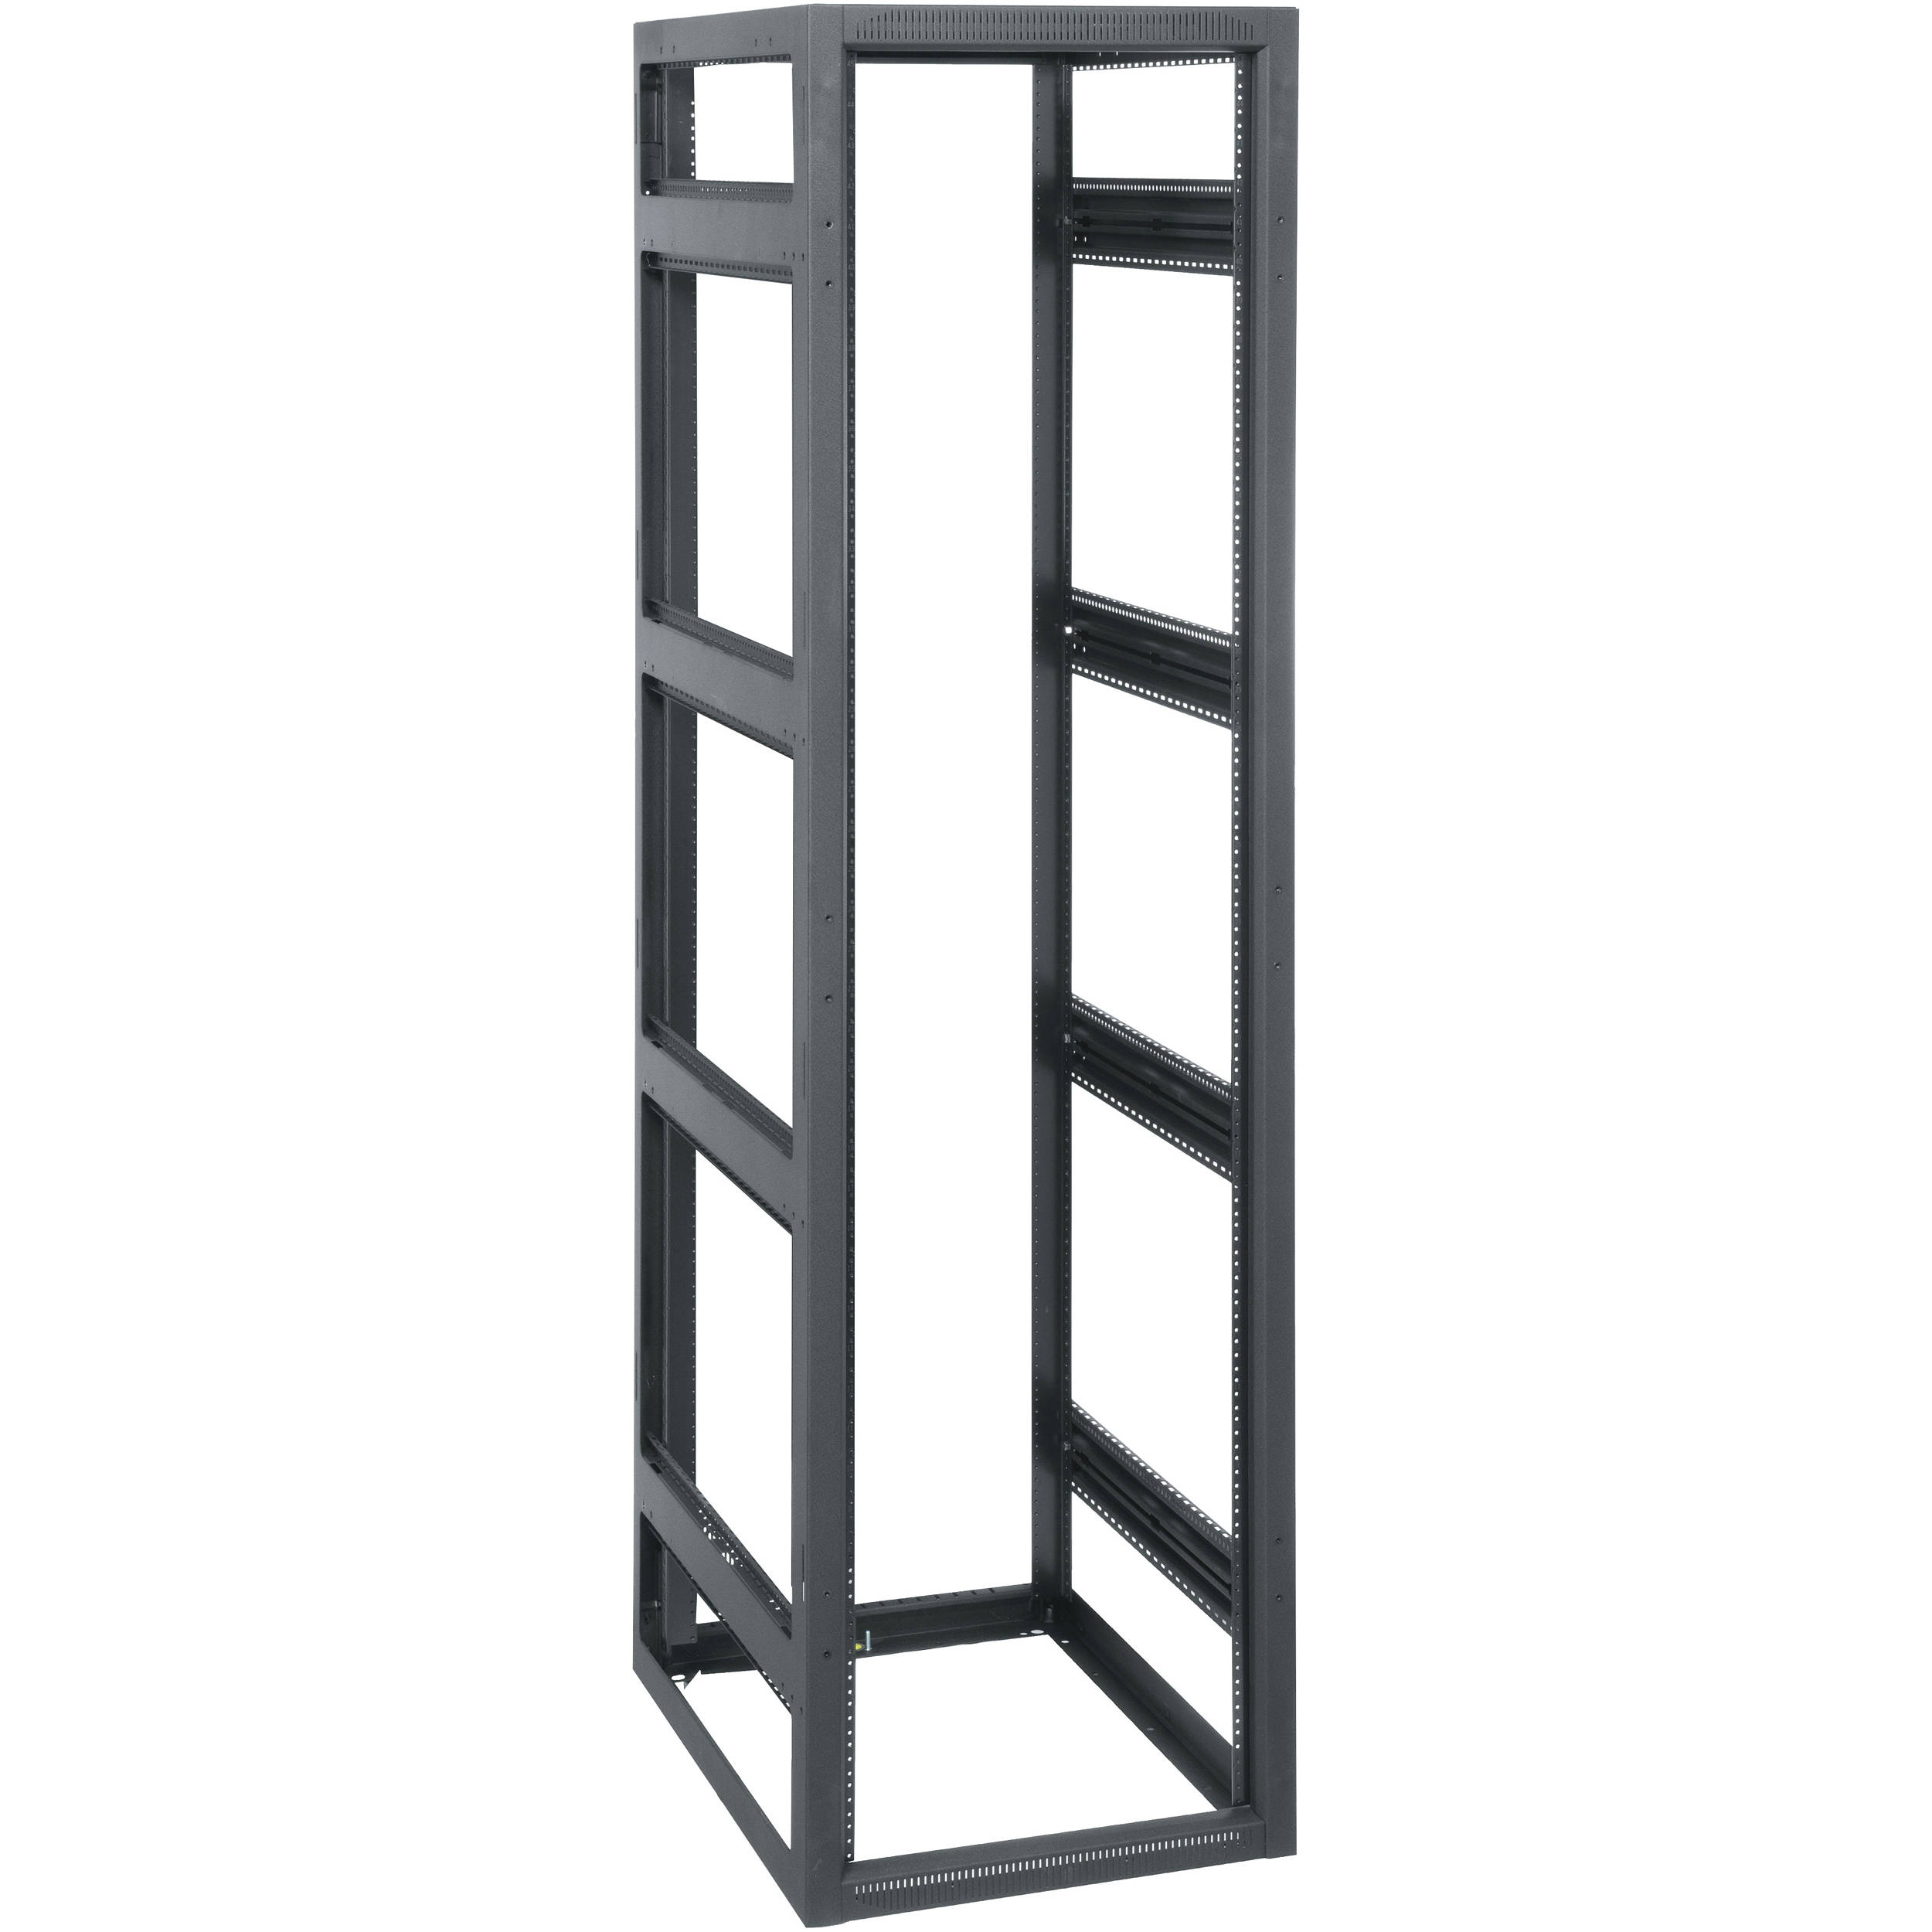 Middle Atlantic BGR-2532 Gangable Rack Enclosure without Rear Door (25 U)